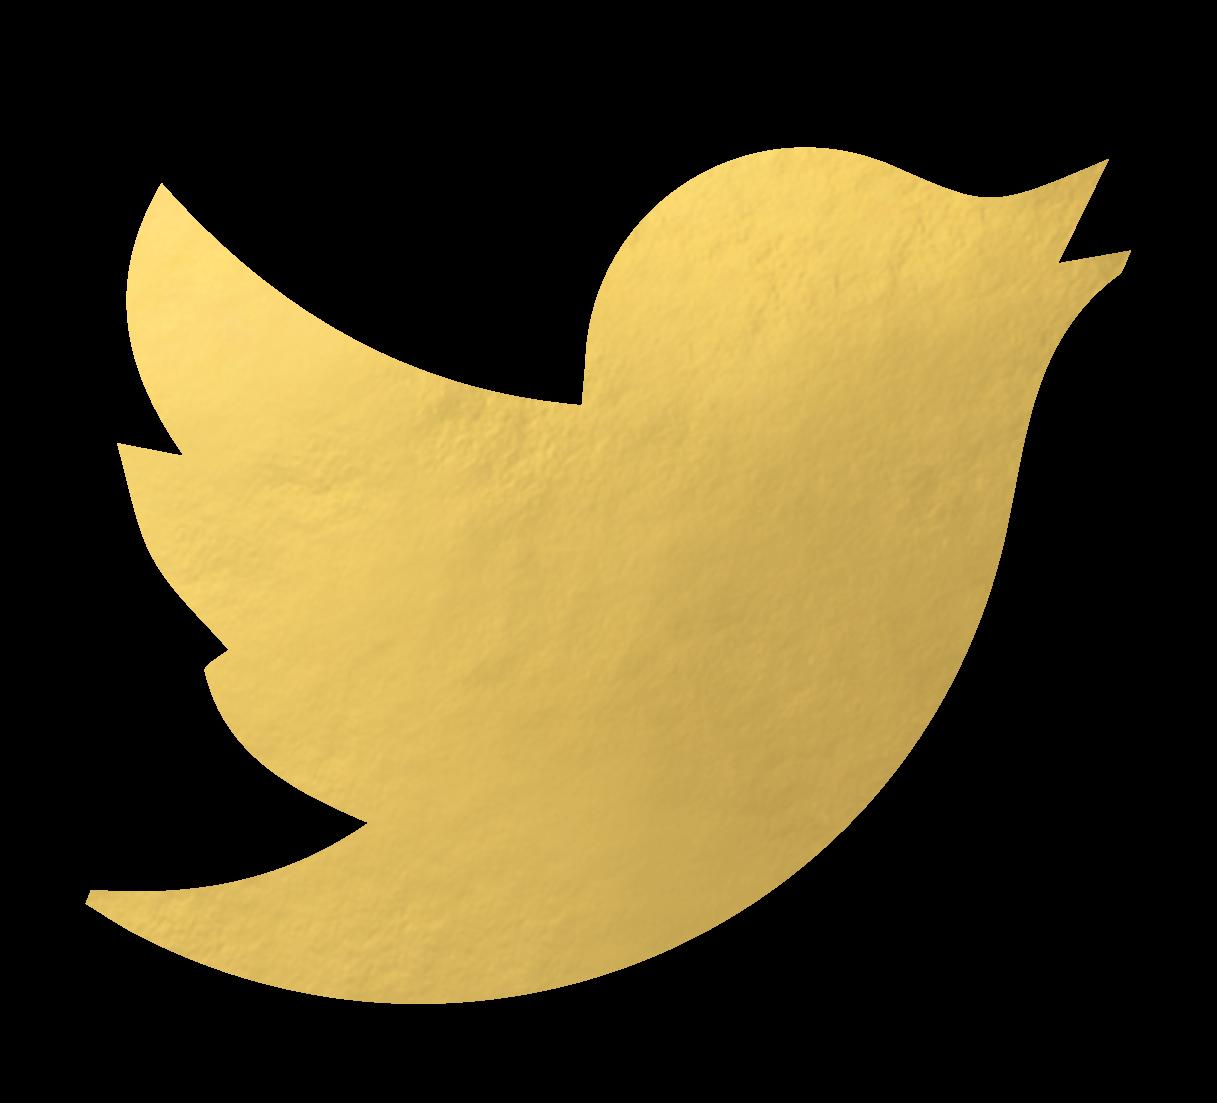 gold-foil-social-media-10-.png